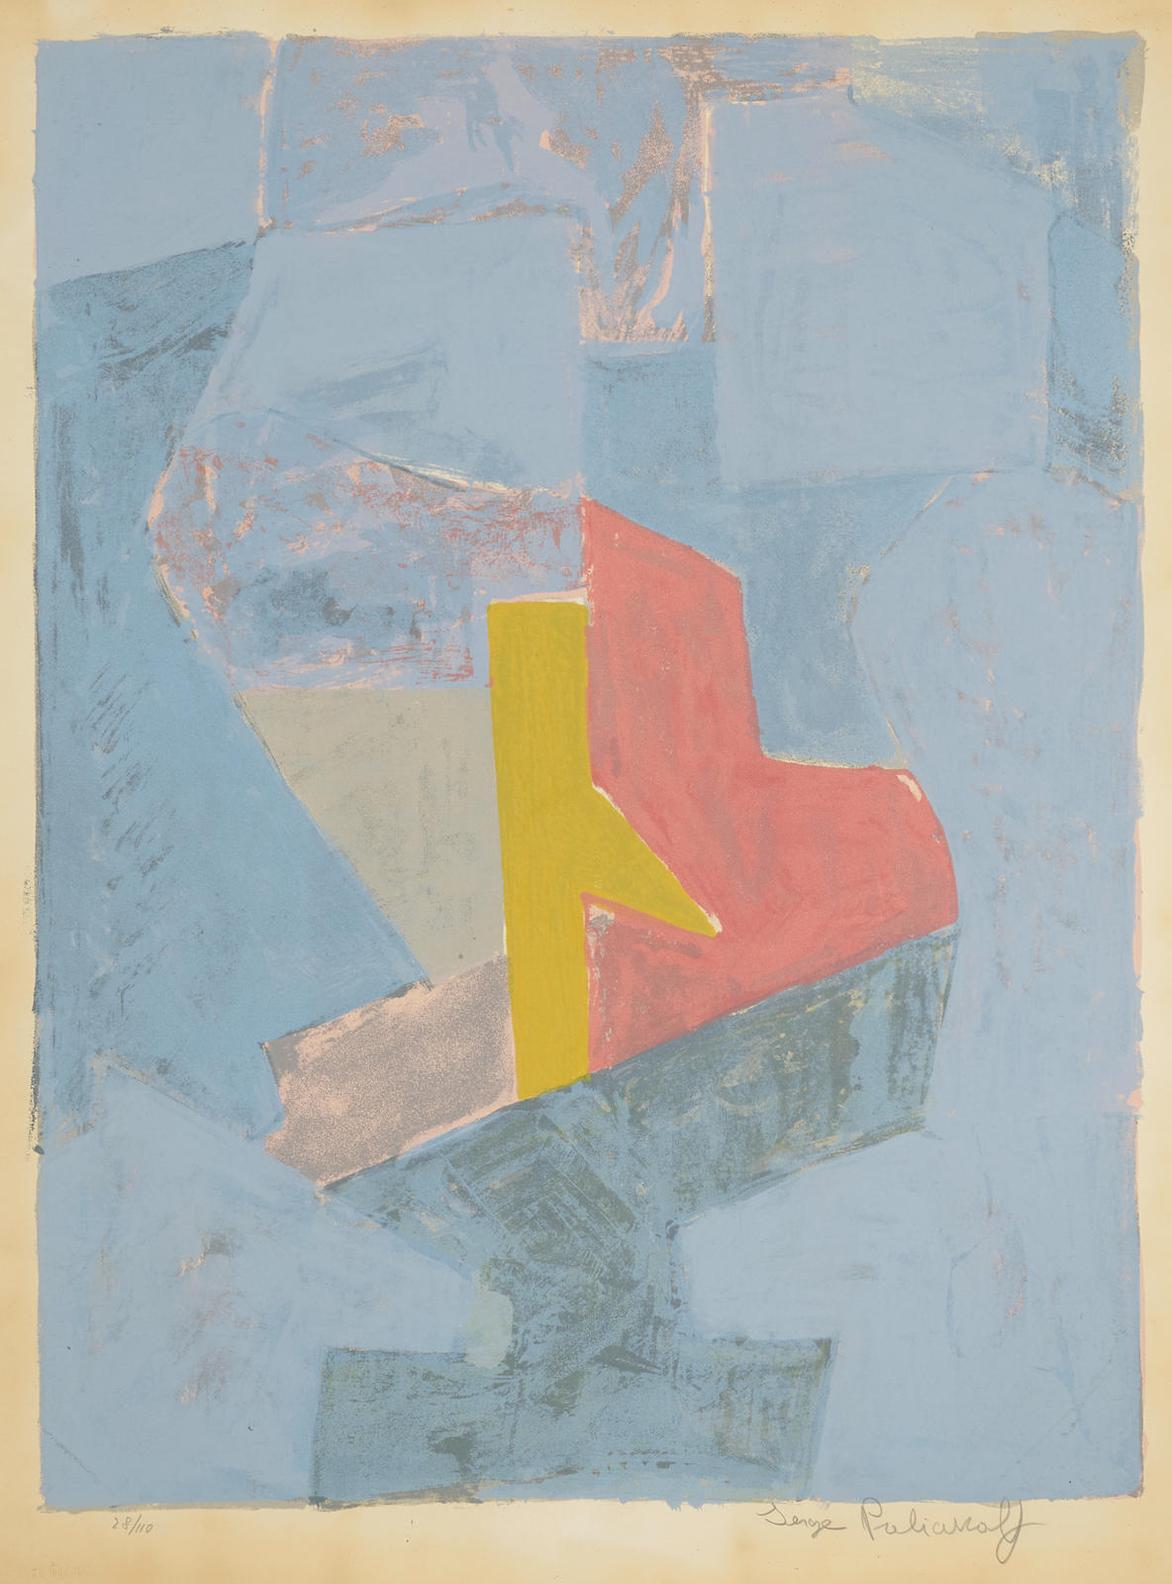 Serge Poliakoff-Composition Bleue, Jaune Et Rouge-1958